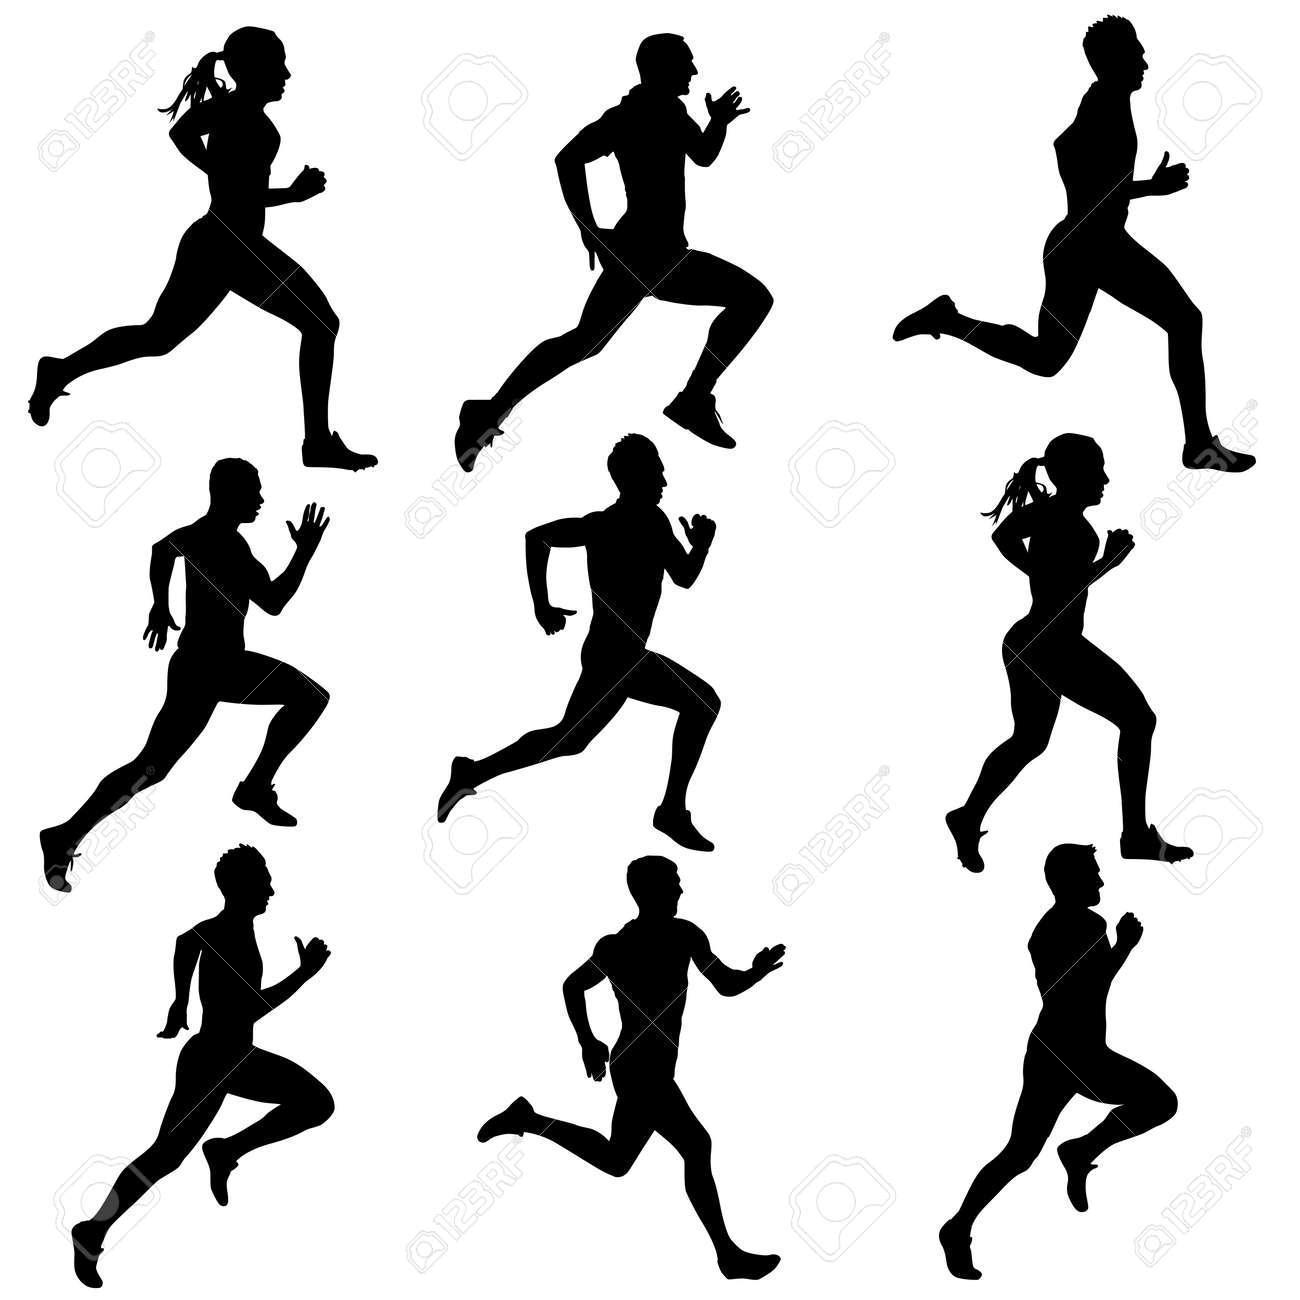 running women silhouettes illustration. - 25964770